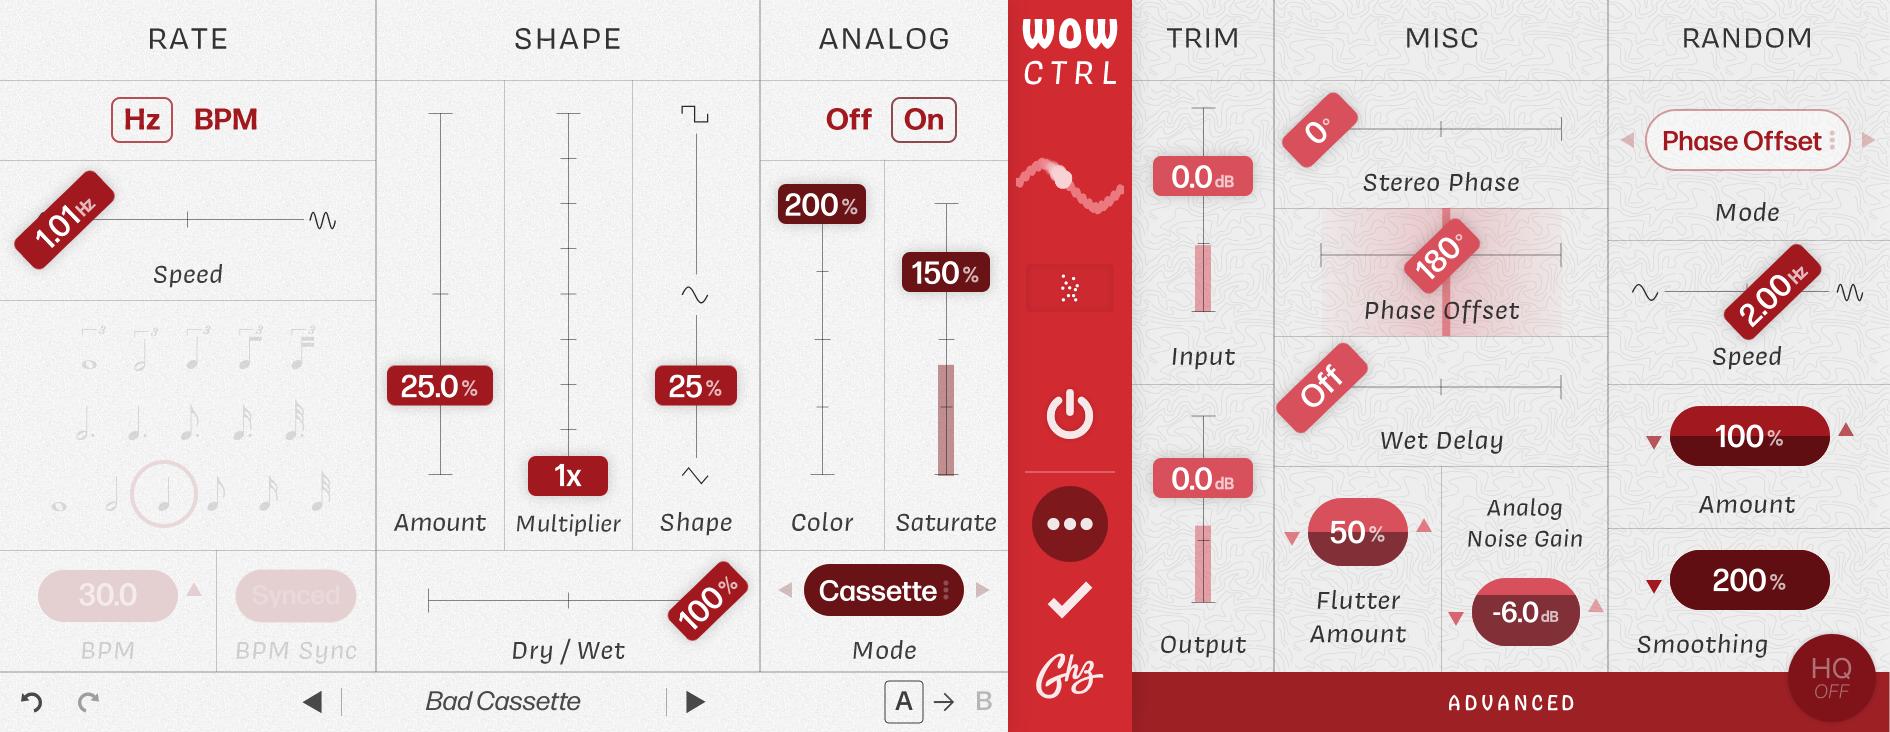 KVR: Wow Control by Goodhertz - Analog Tape Emulator VST